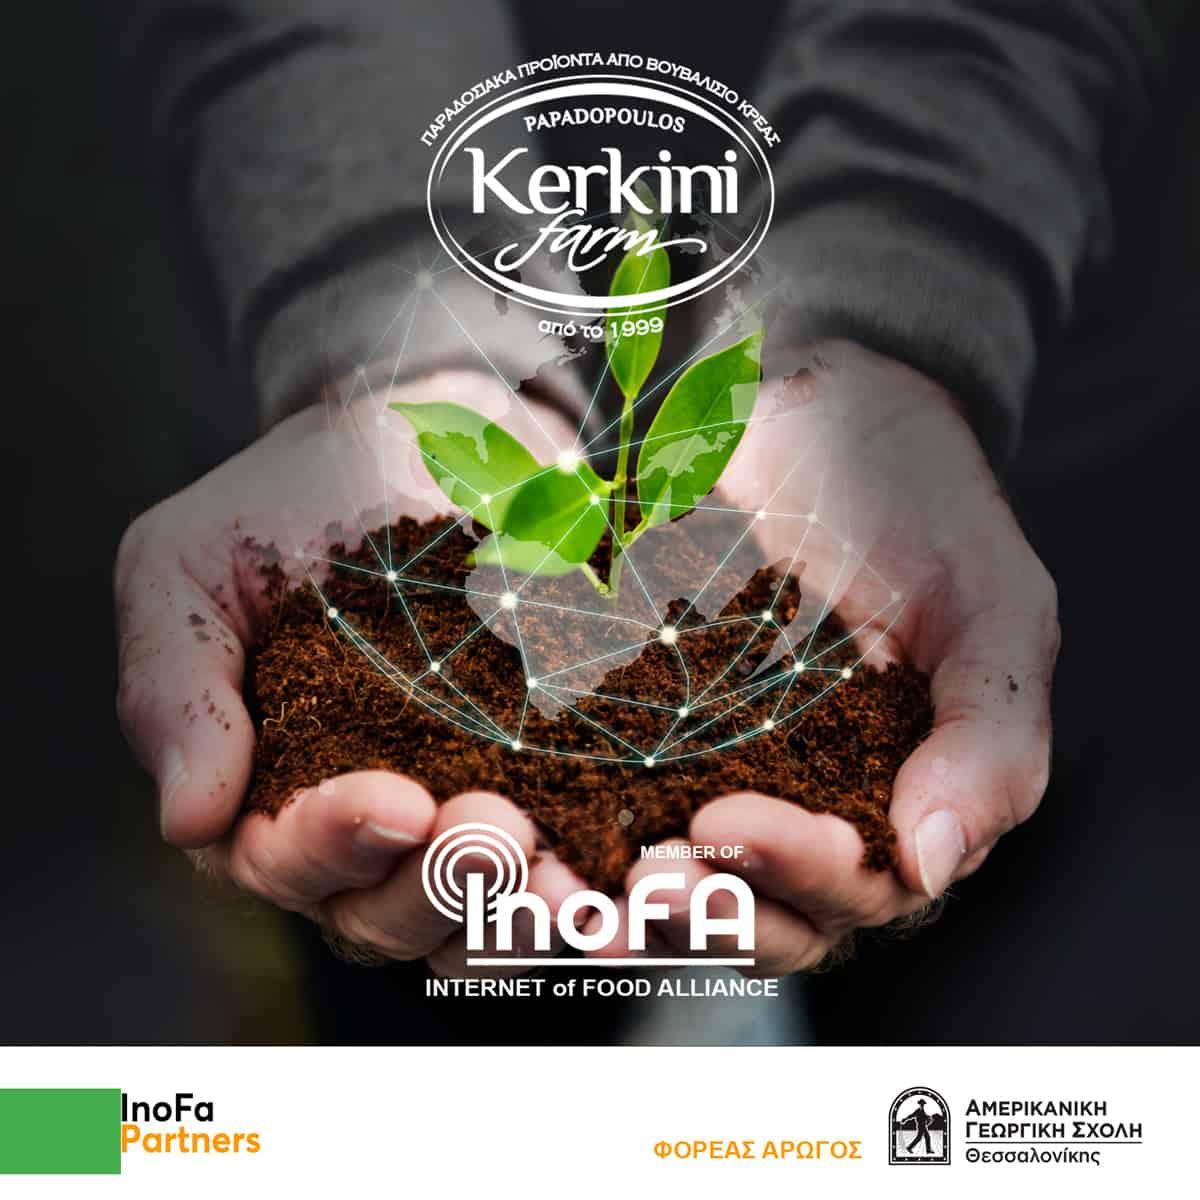 H Kerkini Farm υπερήφανο μέλος του Cluster καινοτομίας Inofa - Internet Food Alliance